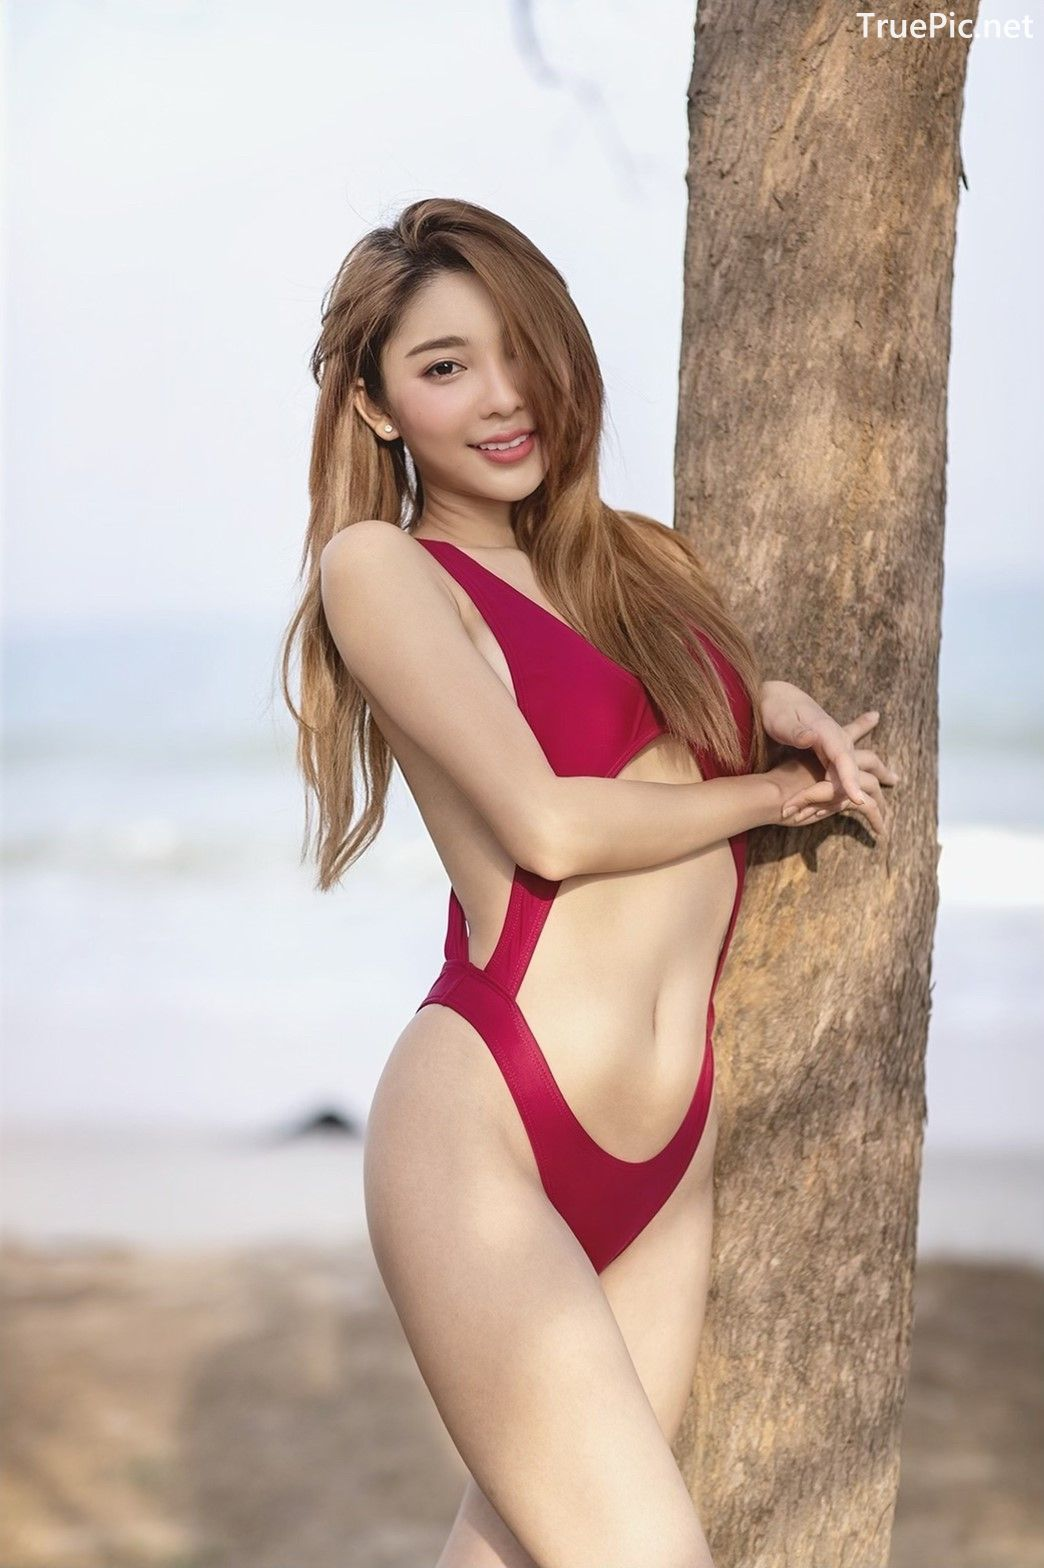 Image Thailand Model – Printlaaplus Zhaengchohm - Mixed Salad Bikini - TruePic.net - Picture-5